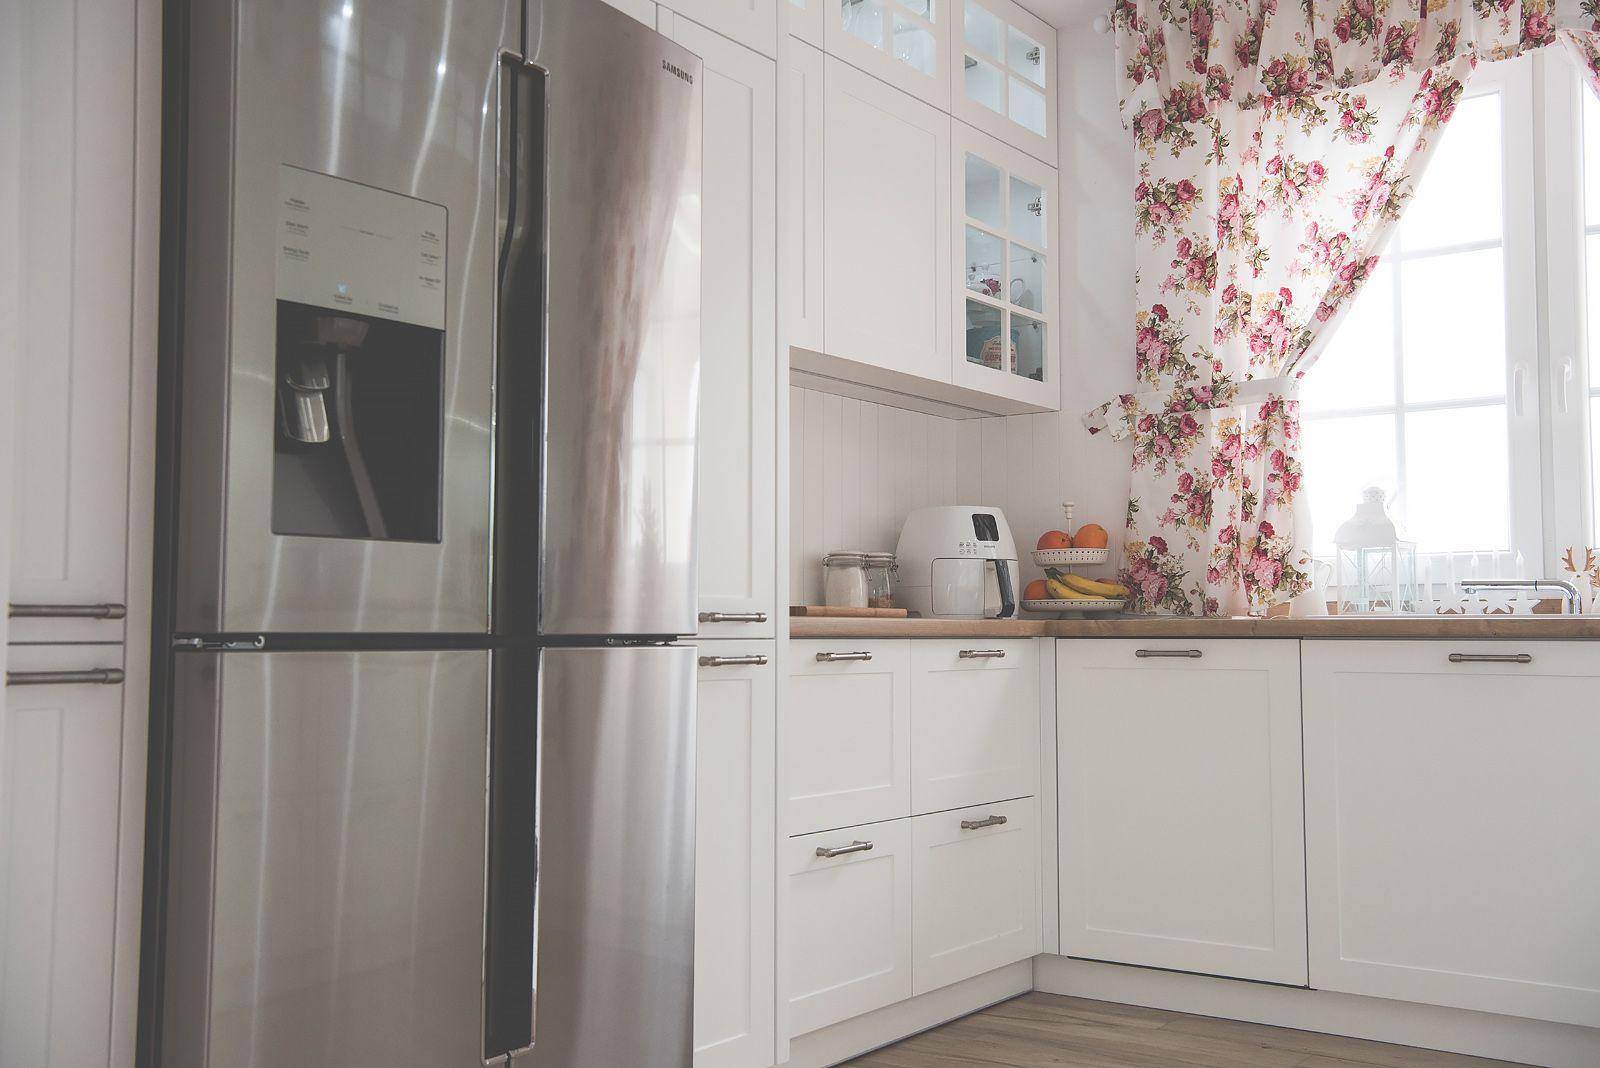 Najlepsza Lodowka Side By Side Home Decor Home Kitchen Cabinets